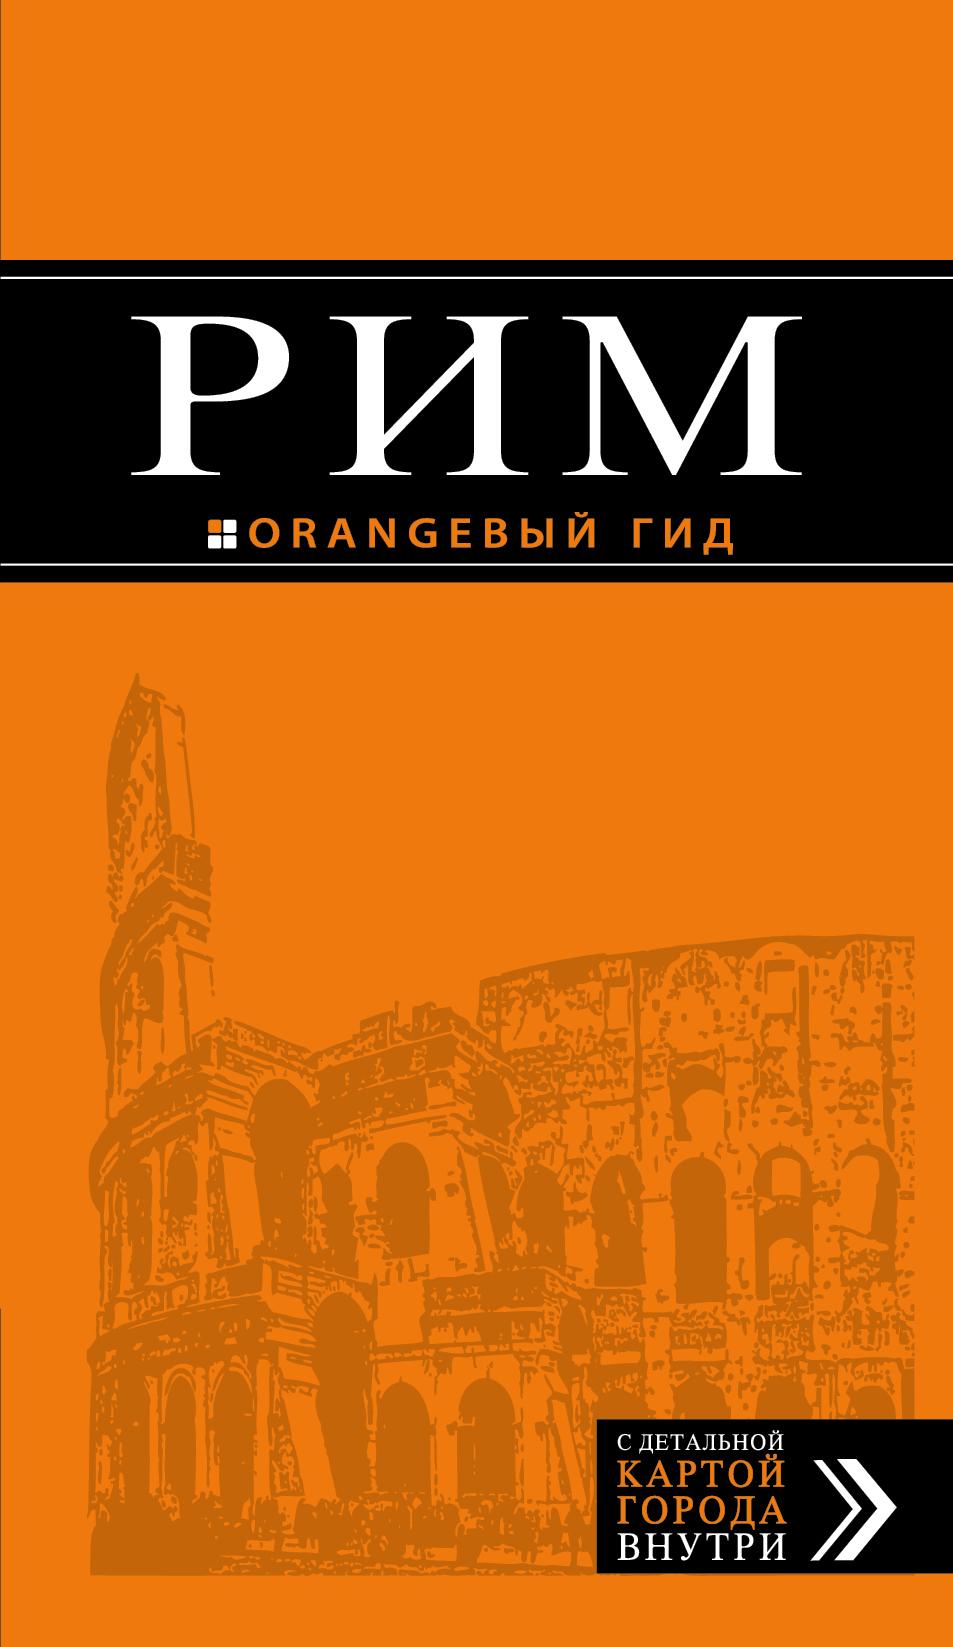 Москва путеводитель карта е изд испр и доп